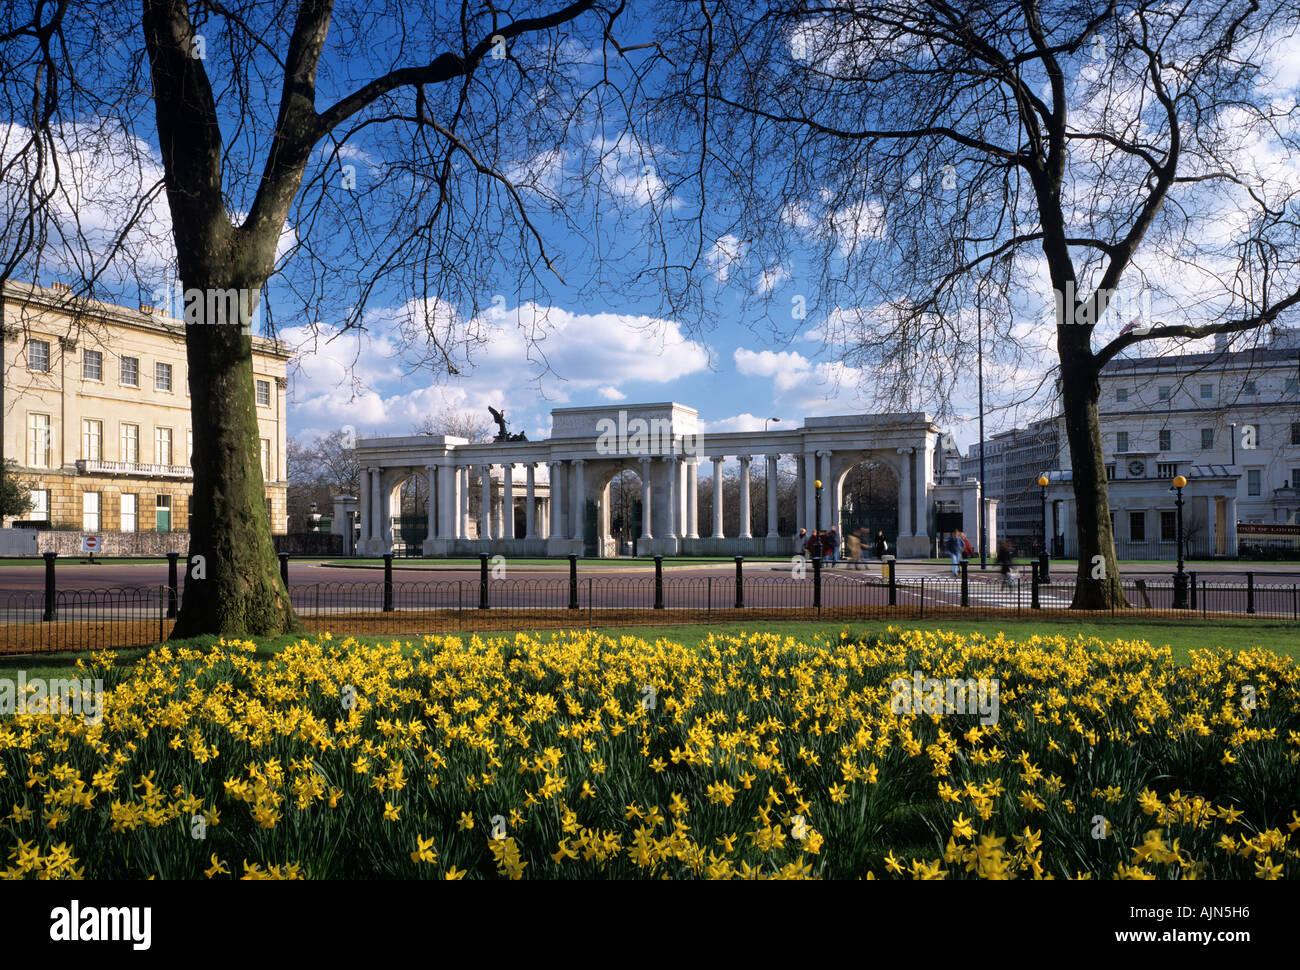 Hyde Park Corner, London, England, UK - Stock Image